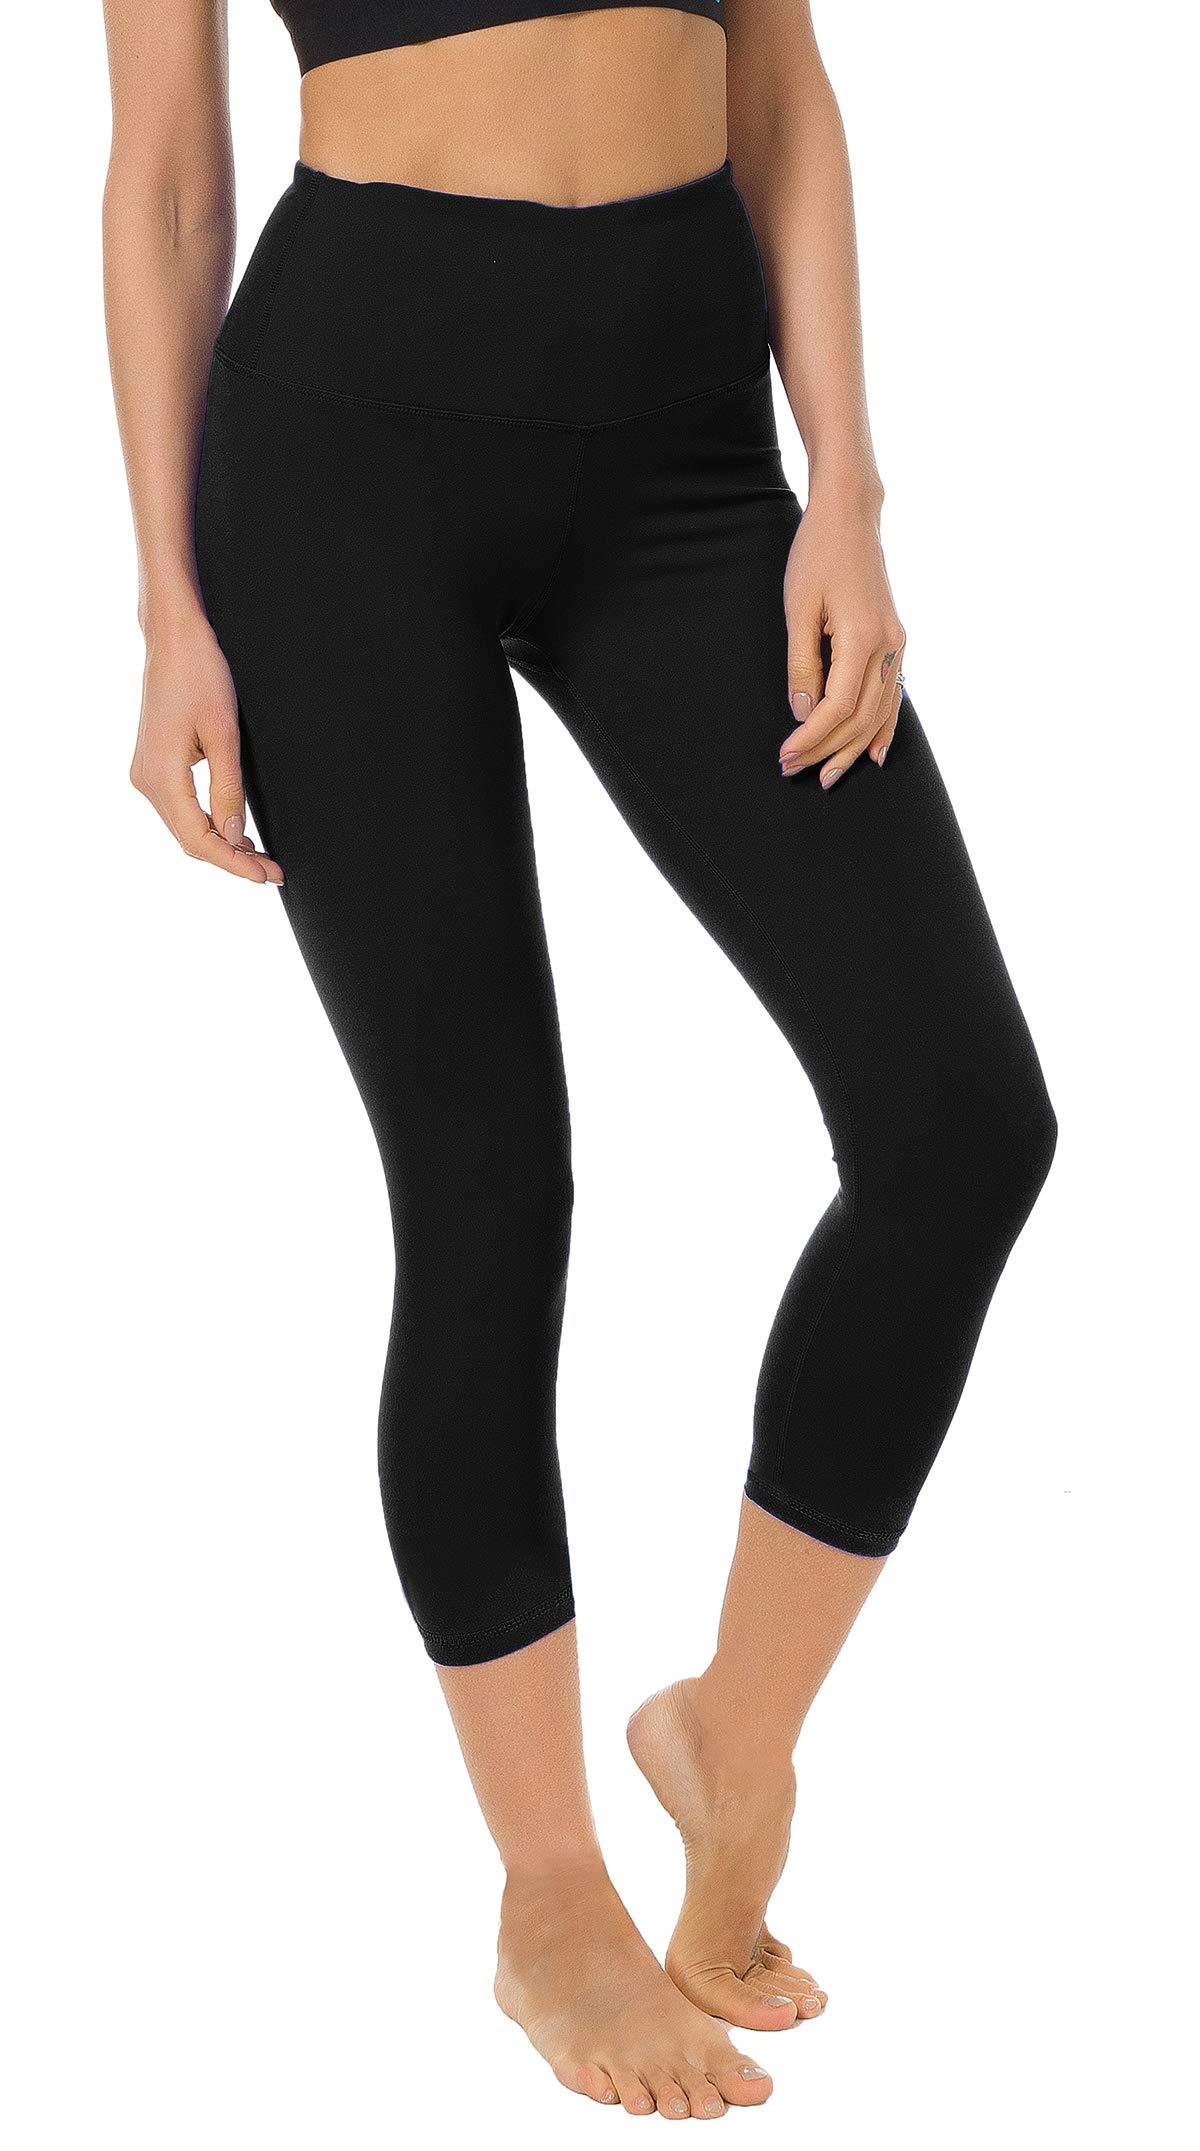 8ec1b3aa338 FIRM ABS Women s Yoga Capris Tummy Control Running Yoga Workout Leggings  Pants Hidden Pocket product image